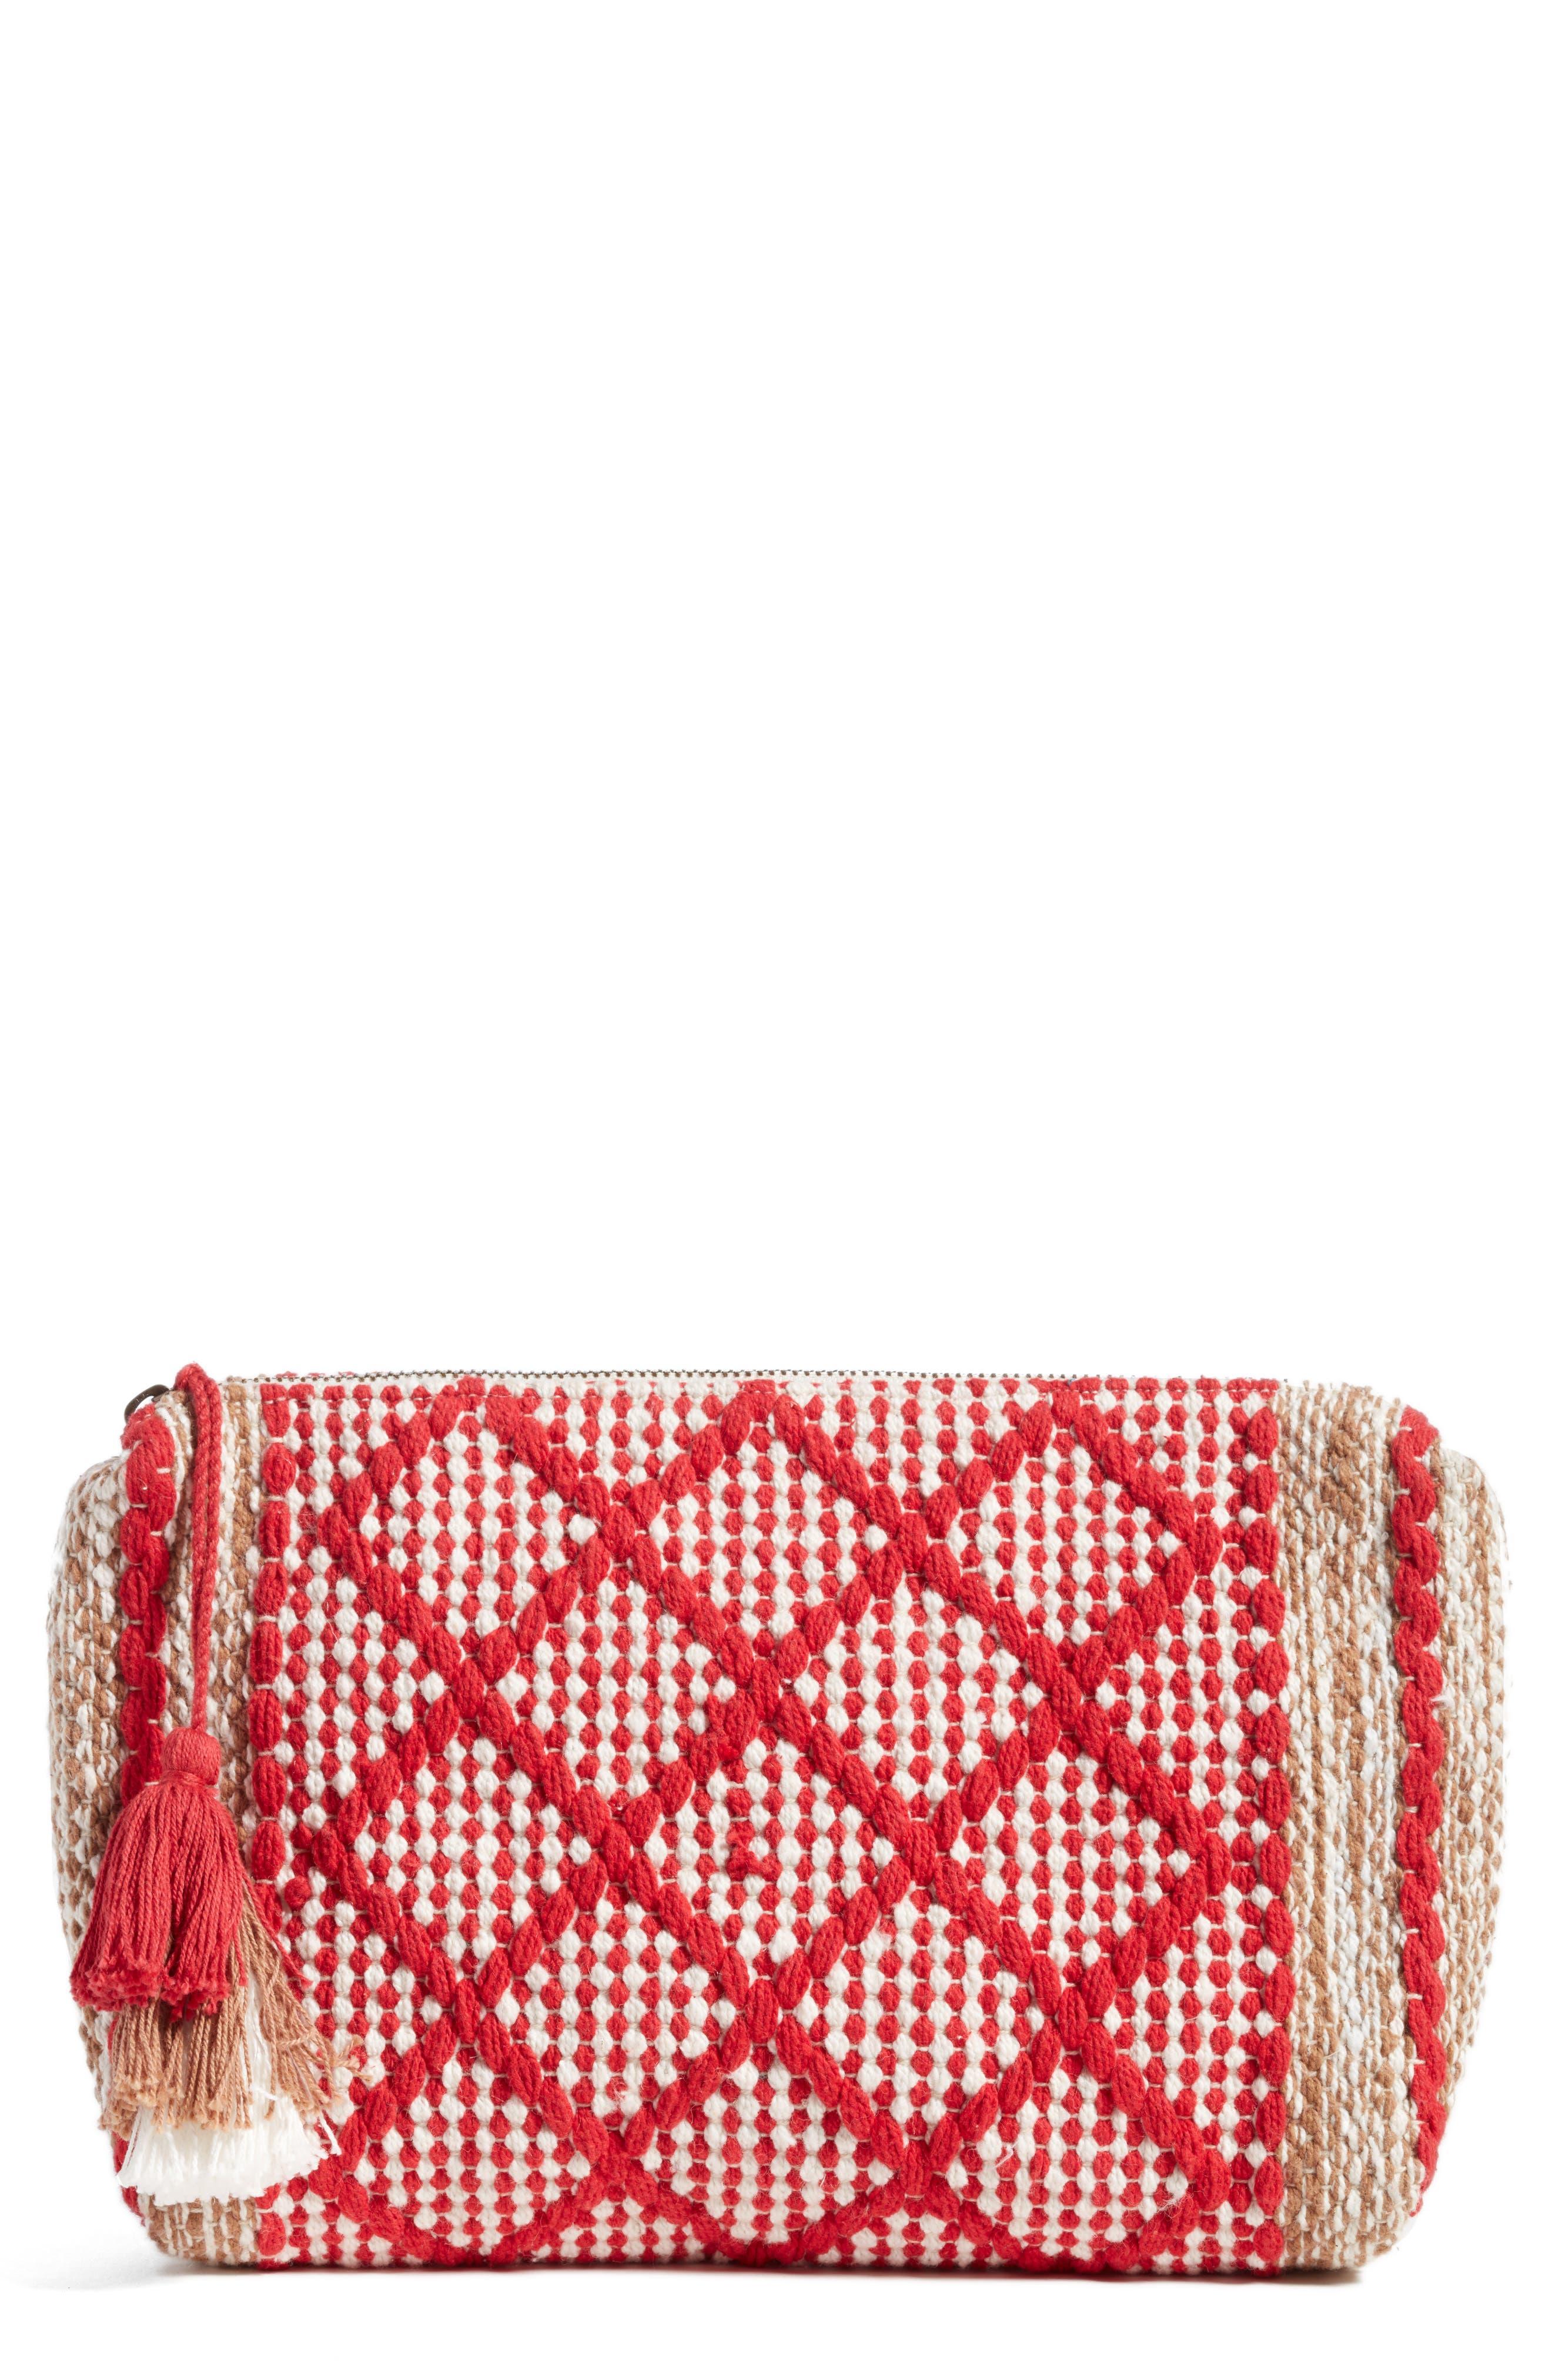 Bag of Tricks Clutch,                         Main,                         color, Rebel Red